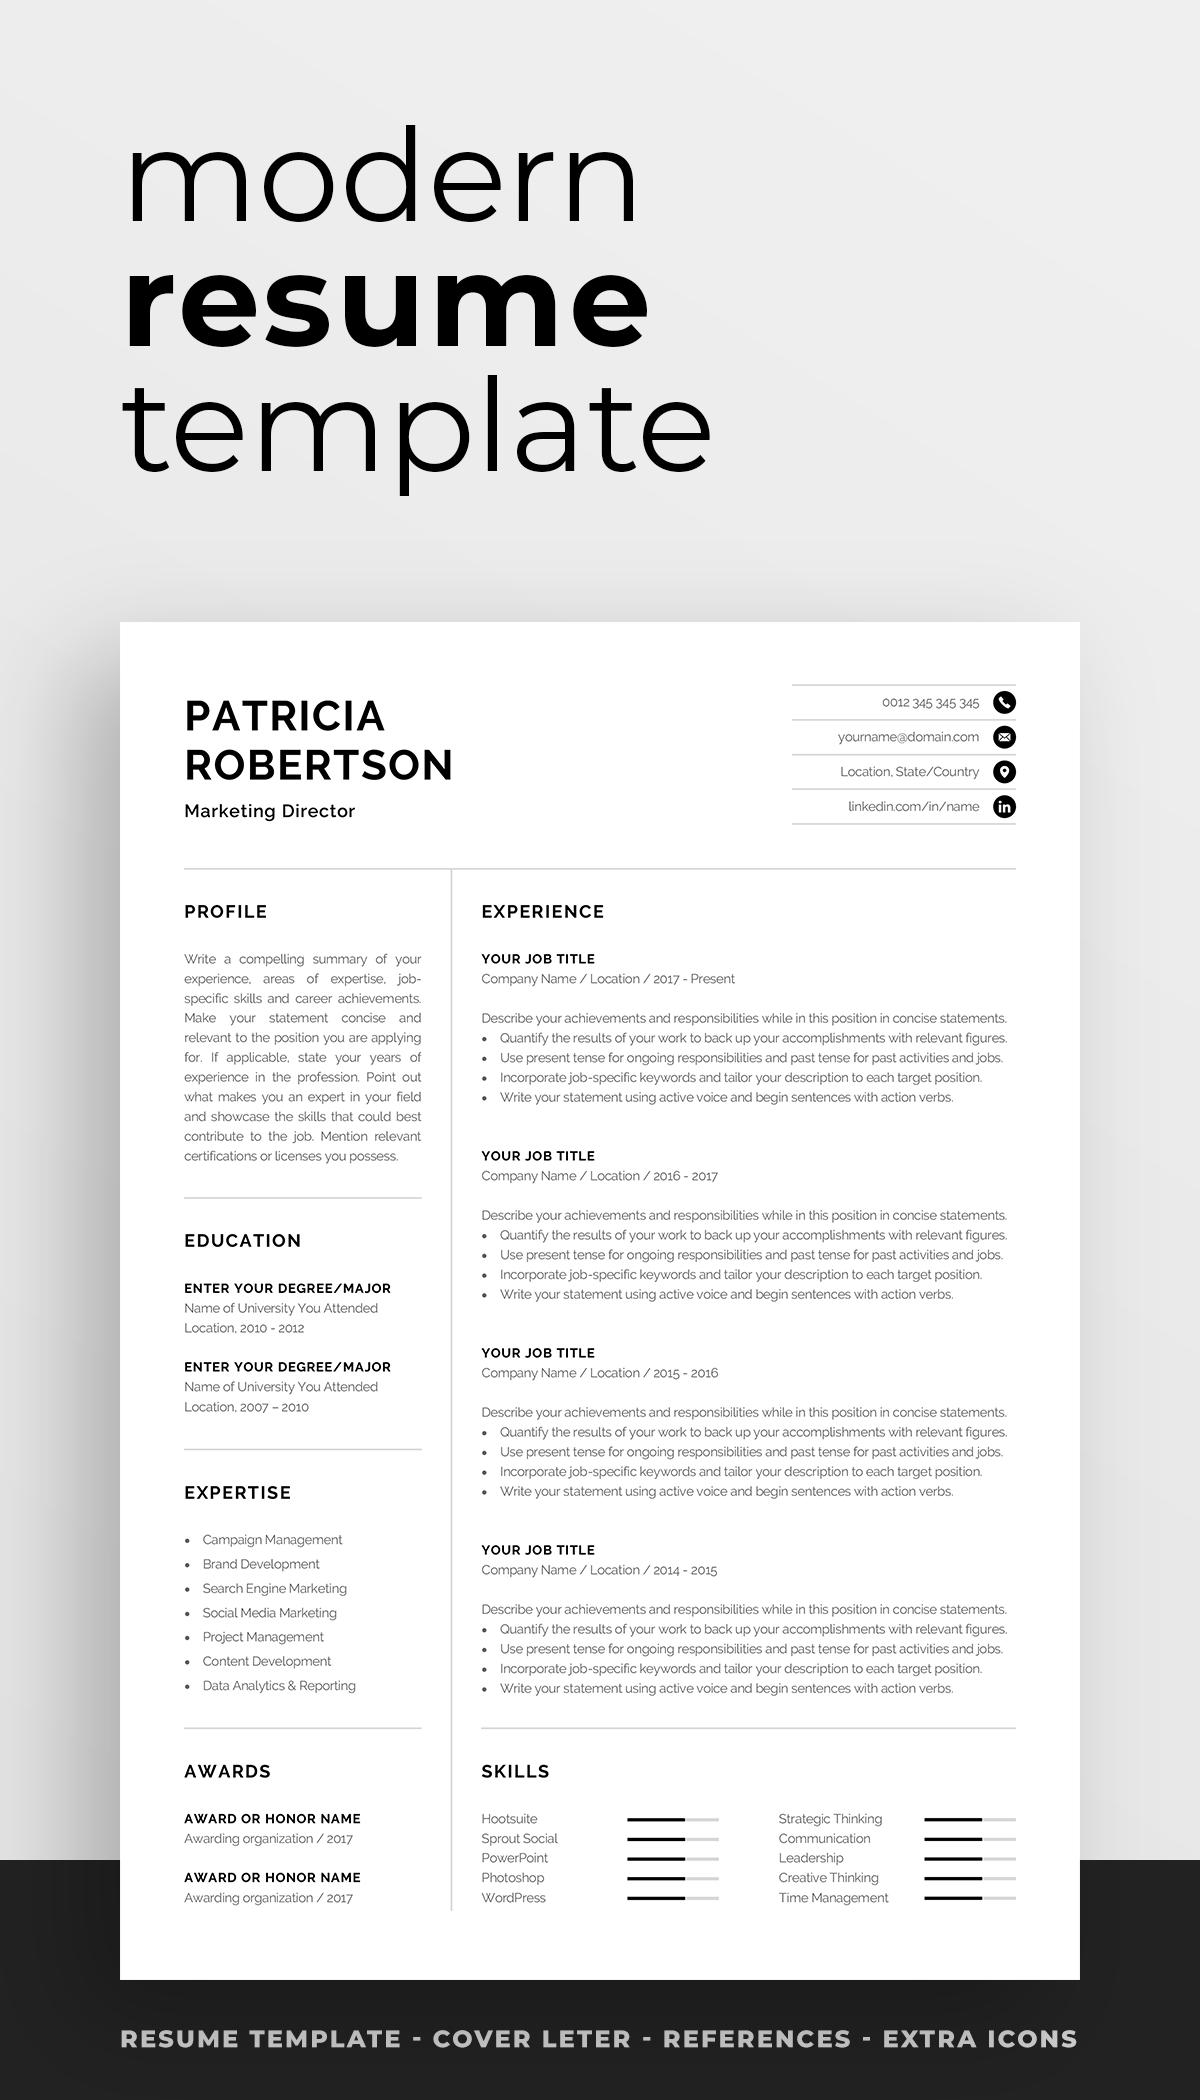 Professional 1 Page Resume Template Modern One Page Cv Word Mac Pages Minimalist Design Developer Designer Marketing Patricia Modern Resume Template Resume Design Creative Modern Resume